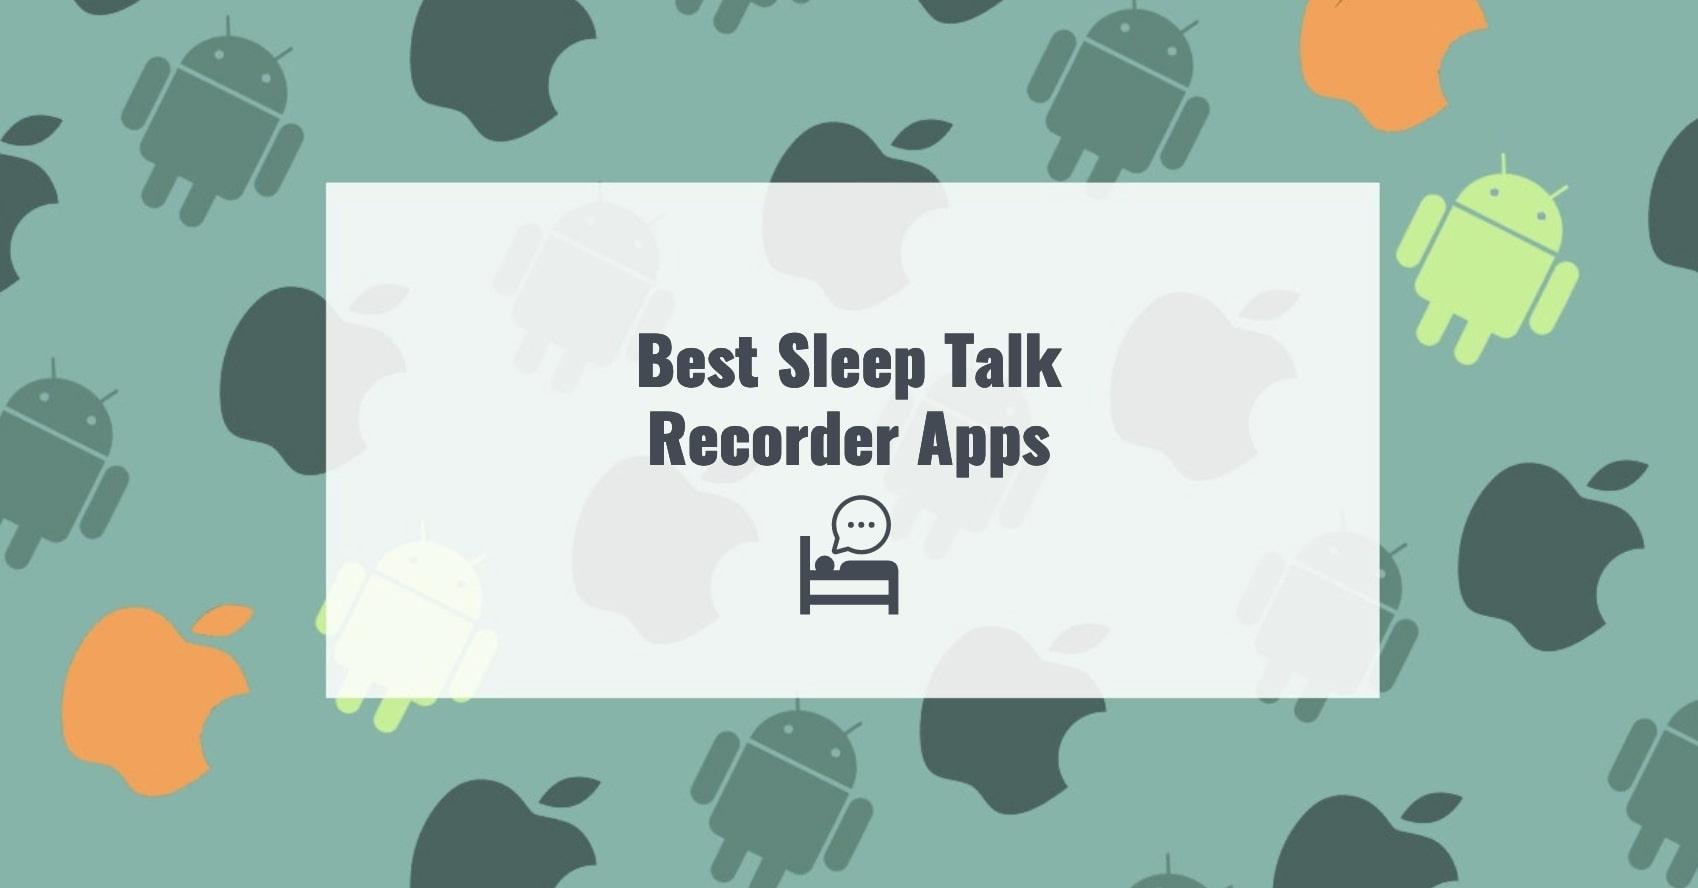 Best Sleep Talk Recorder Apps